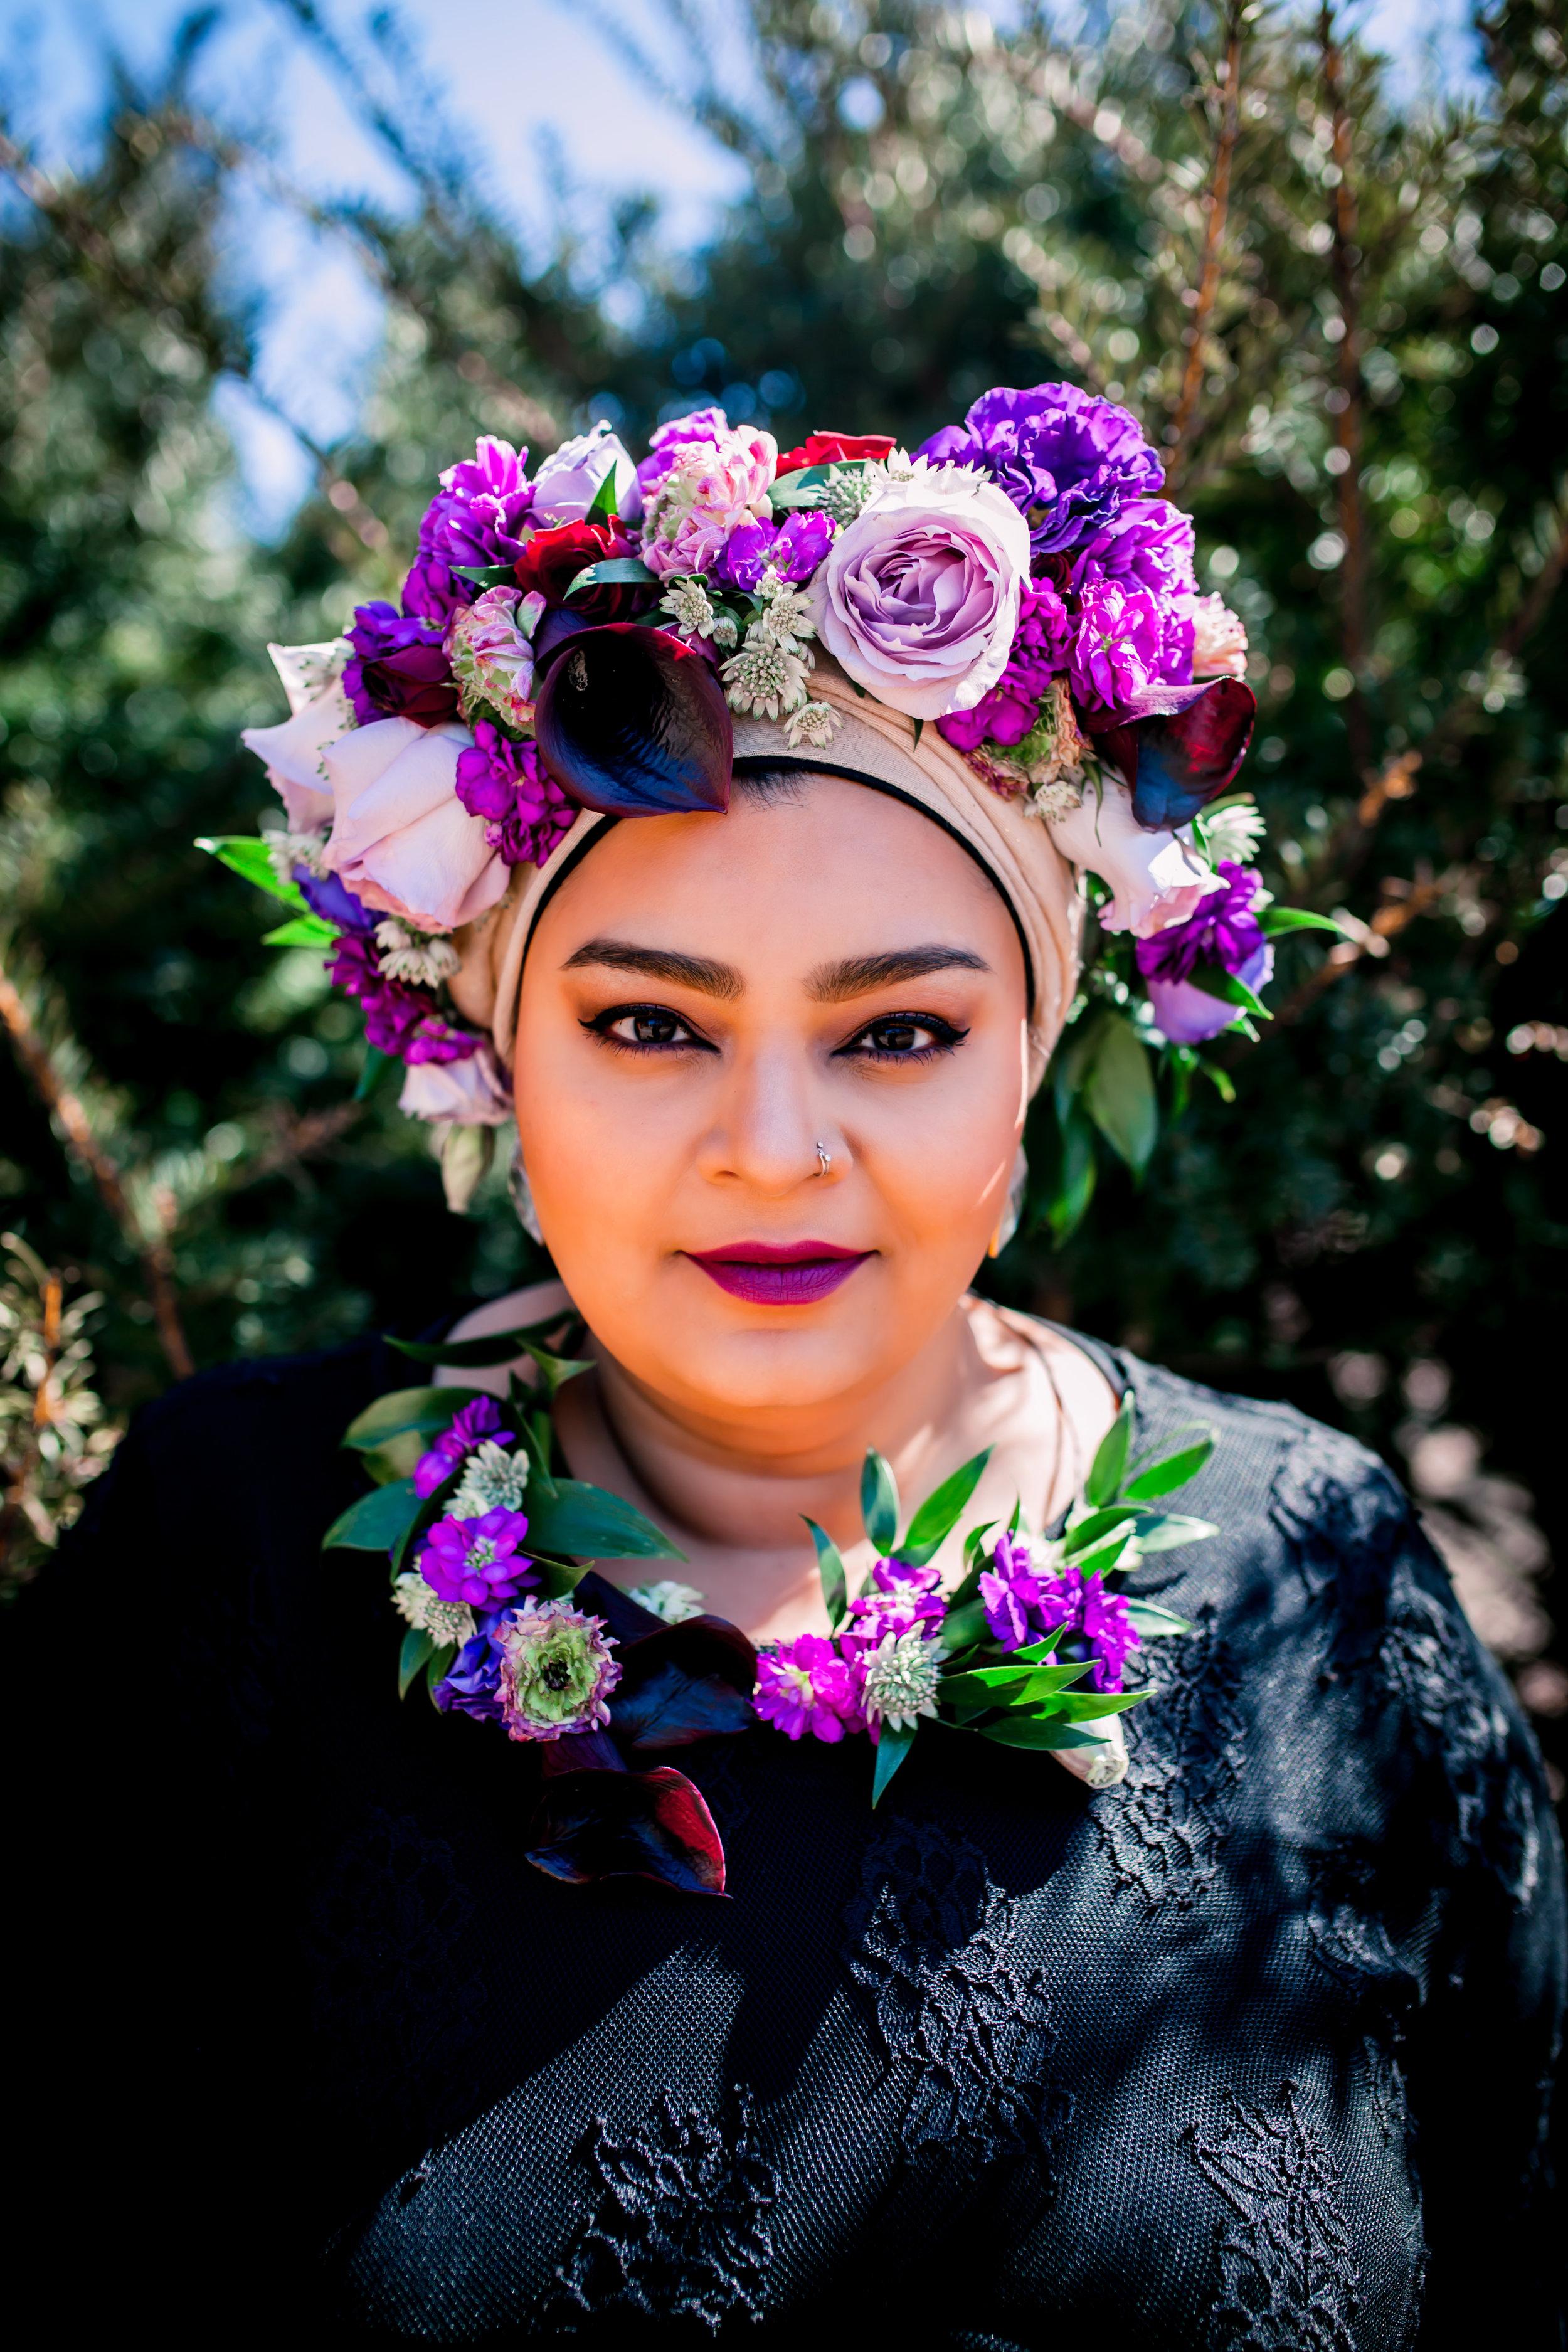 Toronto Photographer Purple Floral Crown Flower Crown Inspiration Canada Photography Portraits Photograph  photo shoot headshot color florist Guildwood park Karimah Gheddai